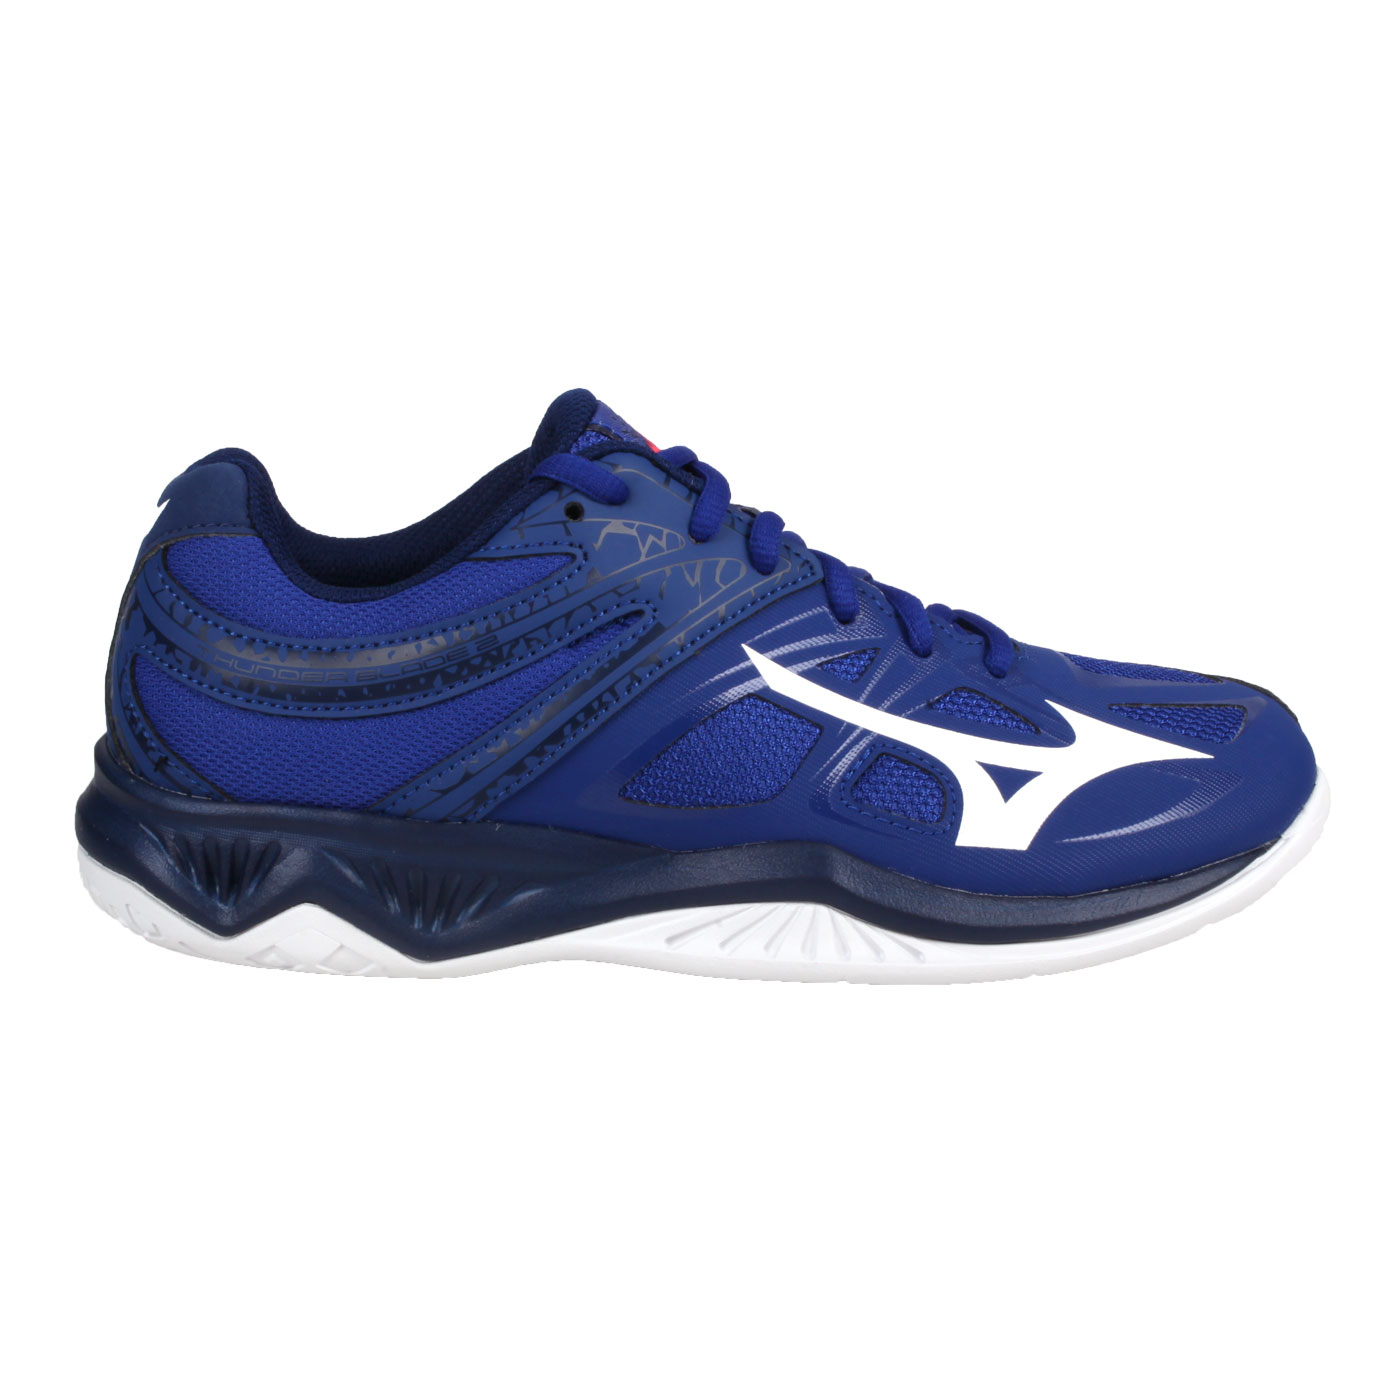 MIZUNO 排球鞋  @THUNDER BLADE 2@V1GA197013 - 深藍白